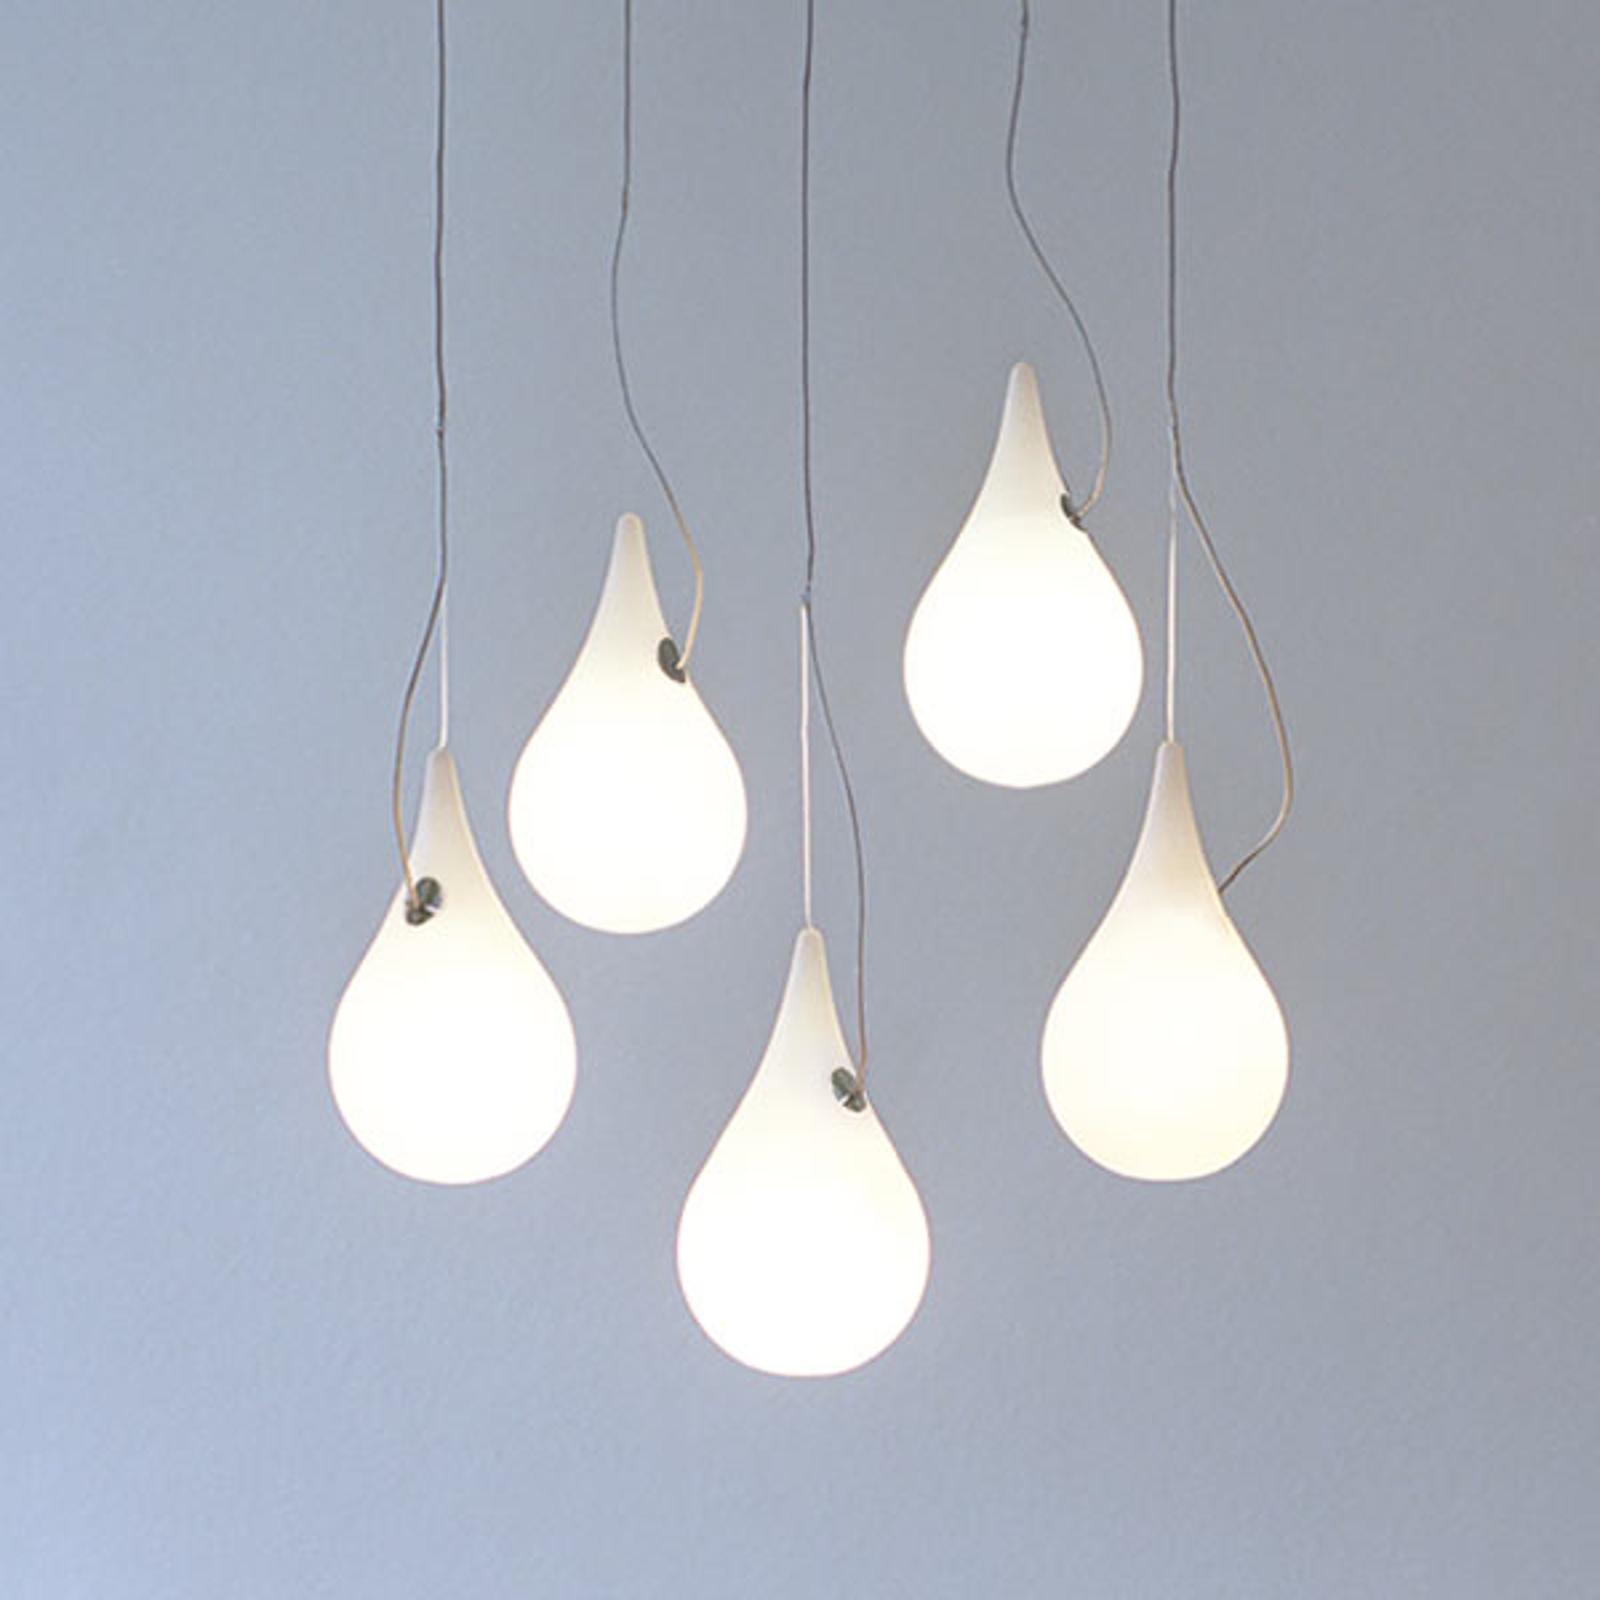 next Drop_2 XS 5 - fünfflammige LED-Hängeleuchte